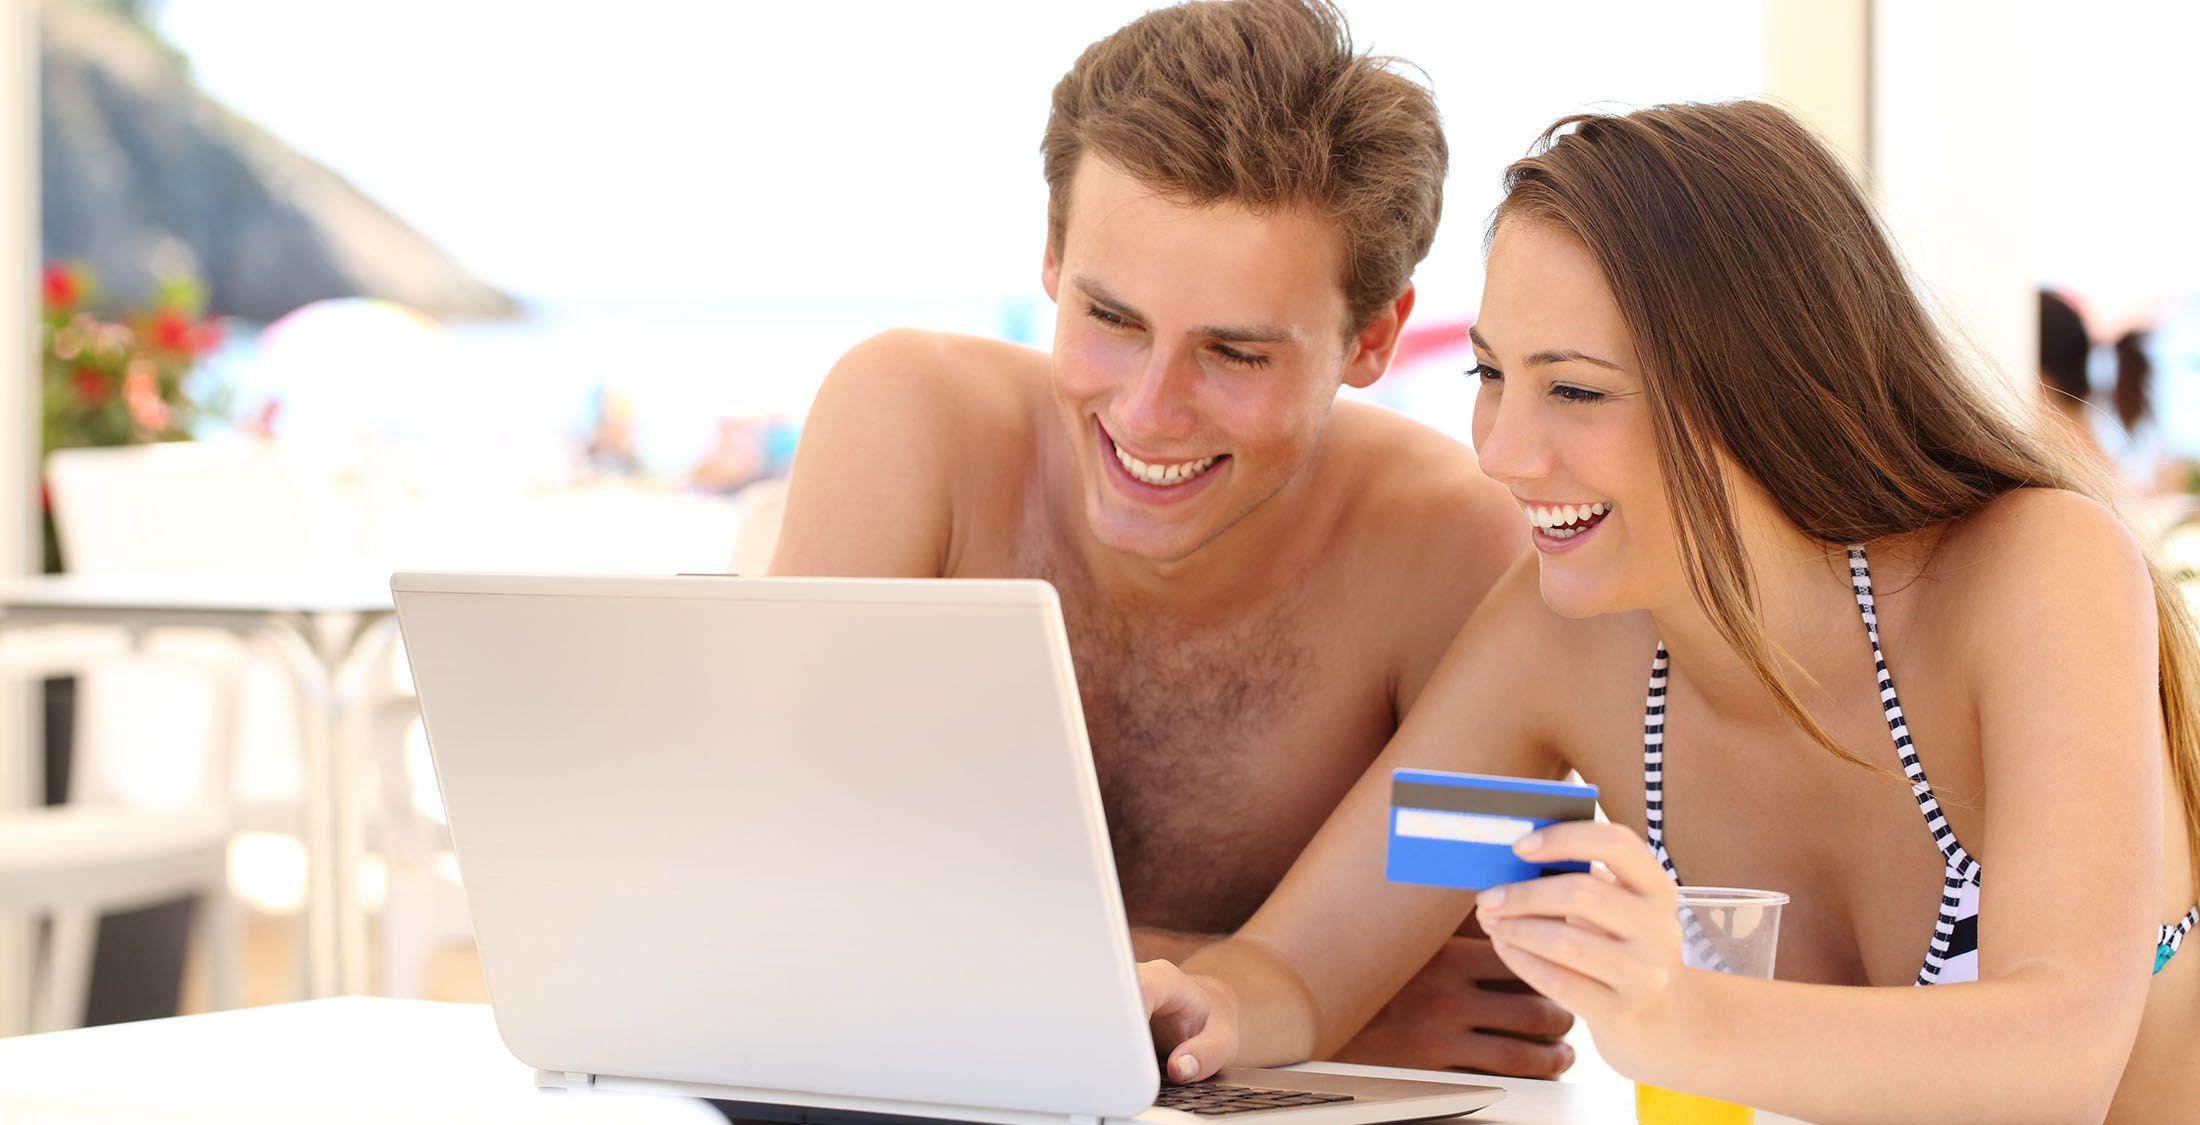 couple looking at laptop at resort